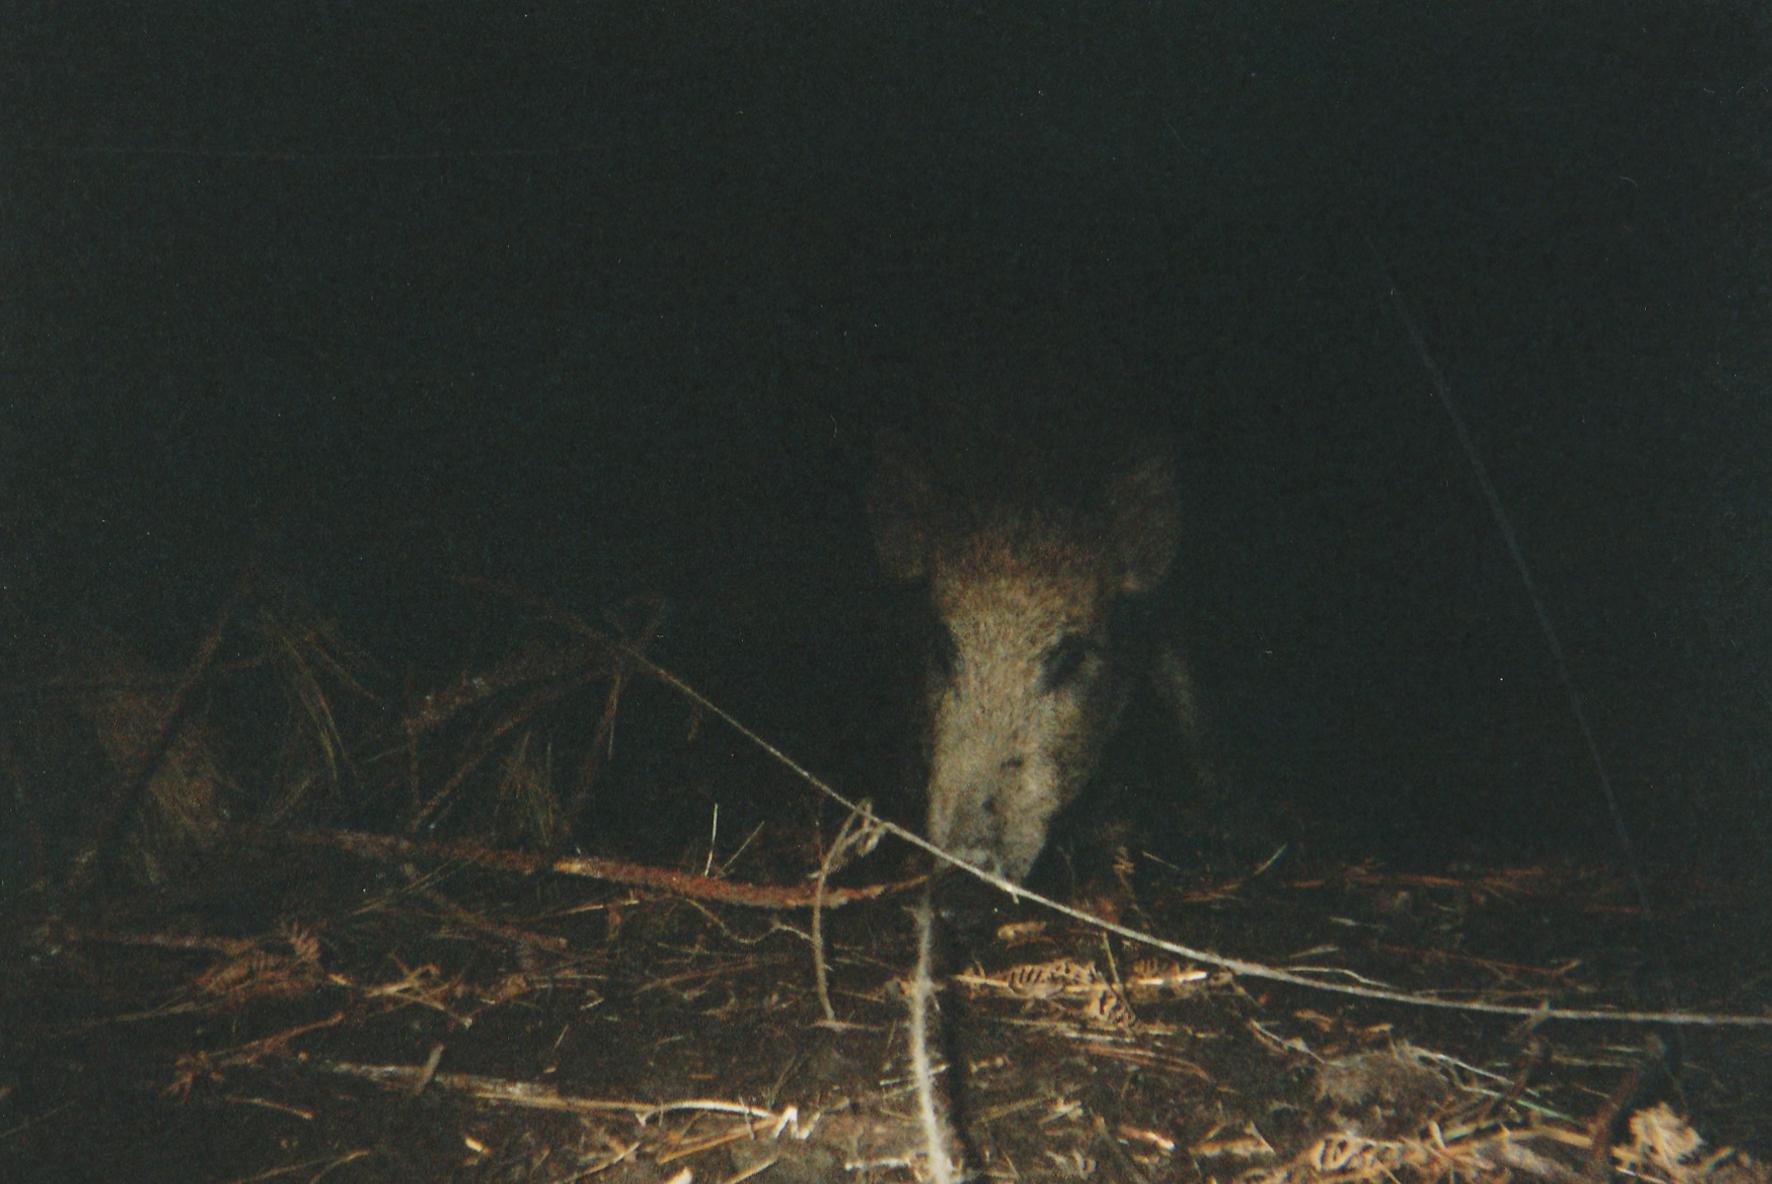 Wild Boar Photos 02.jpg